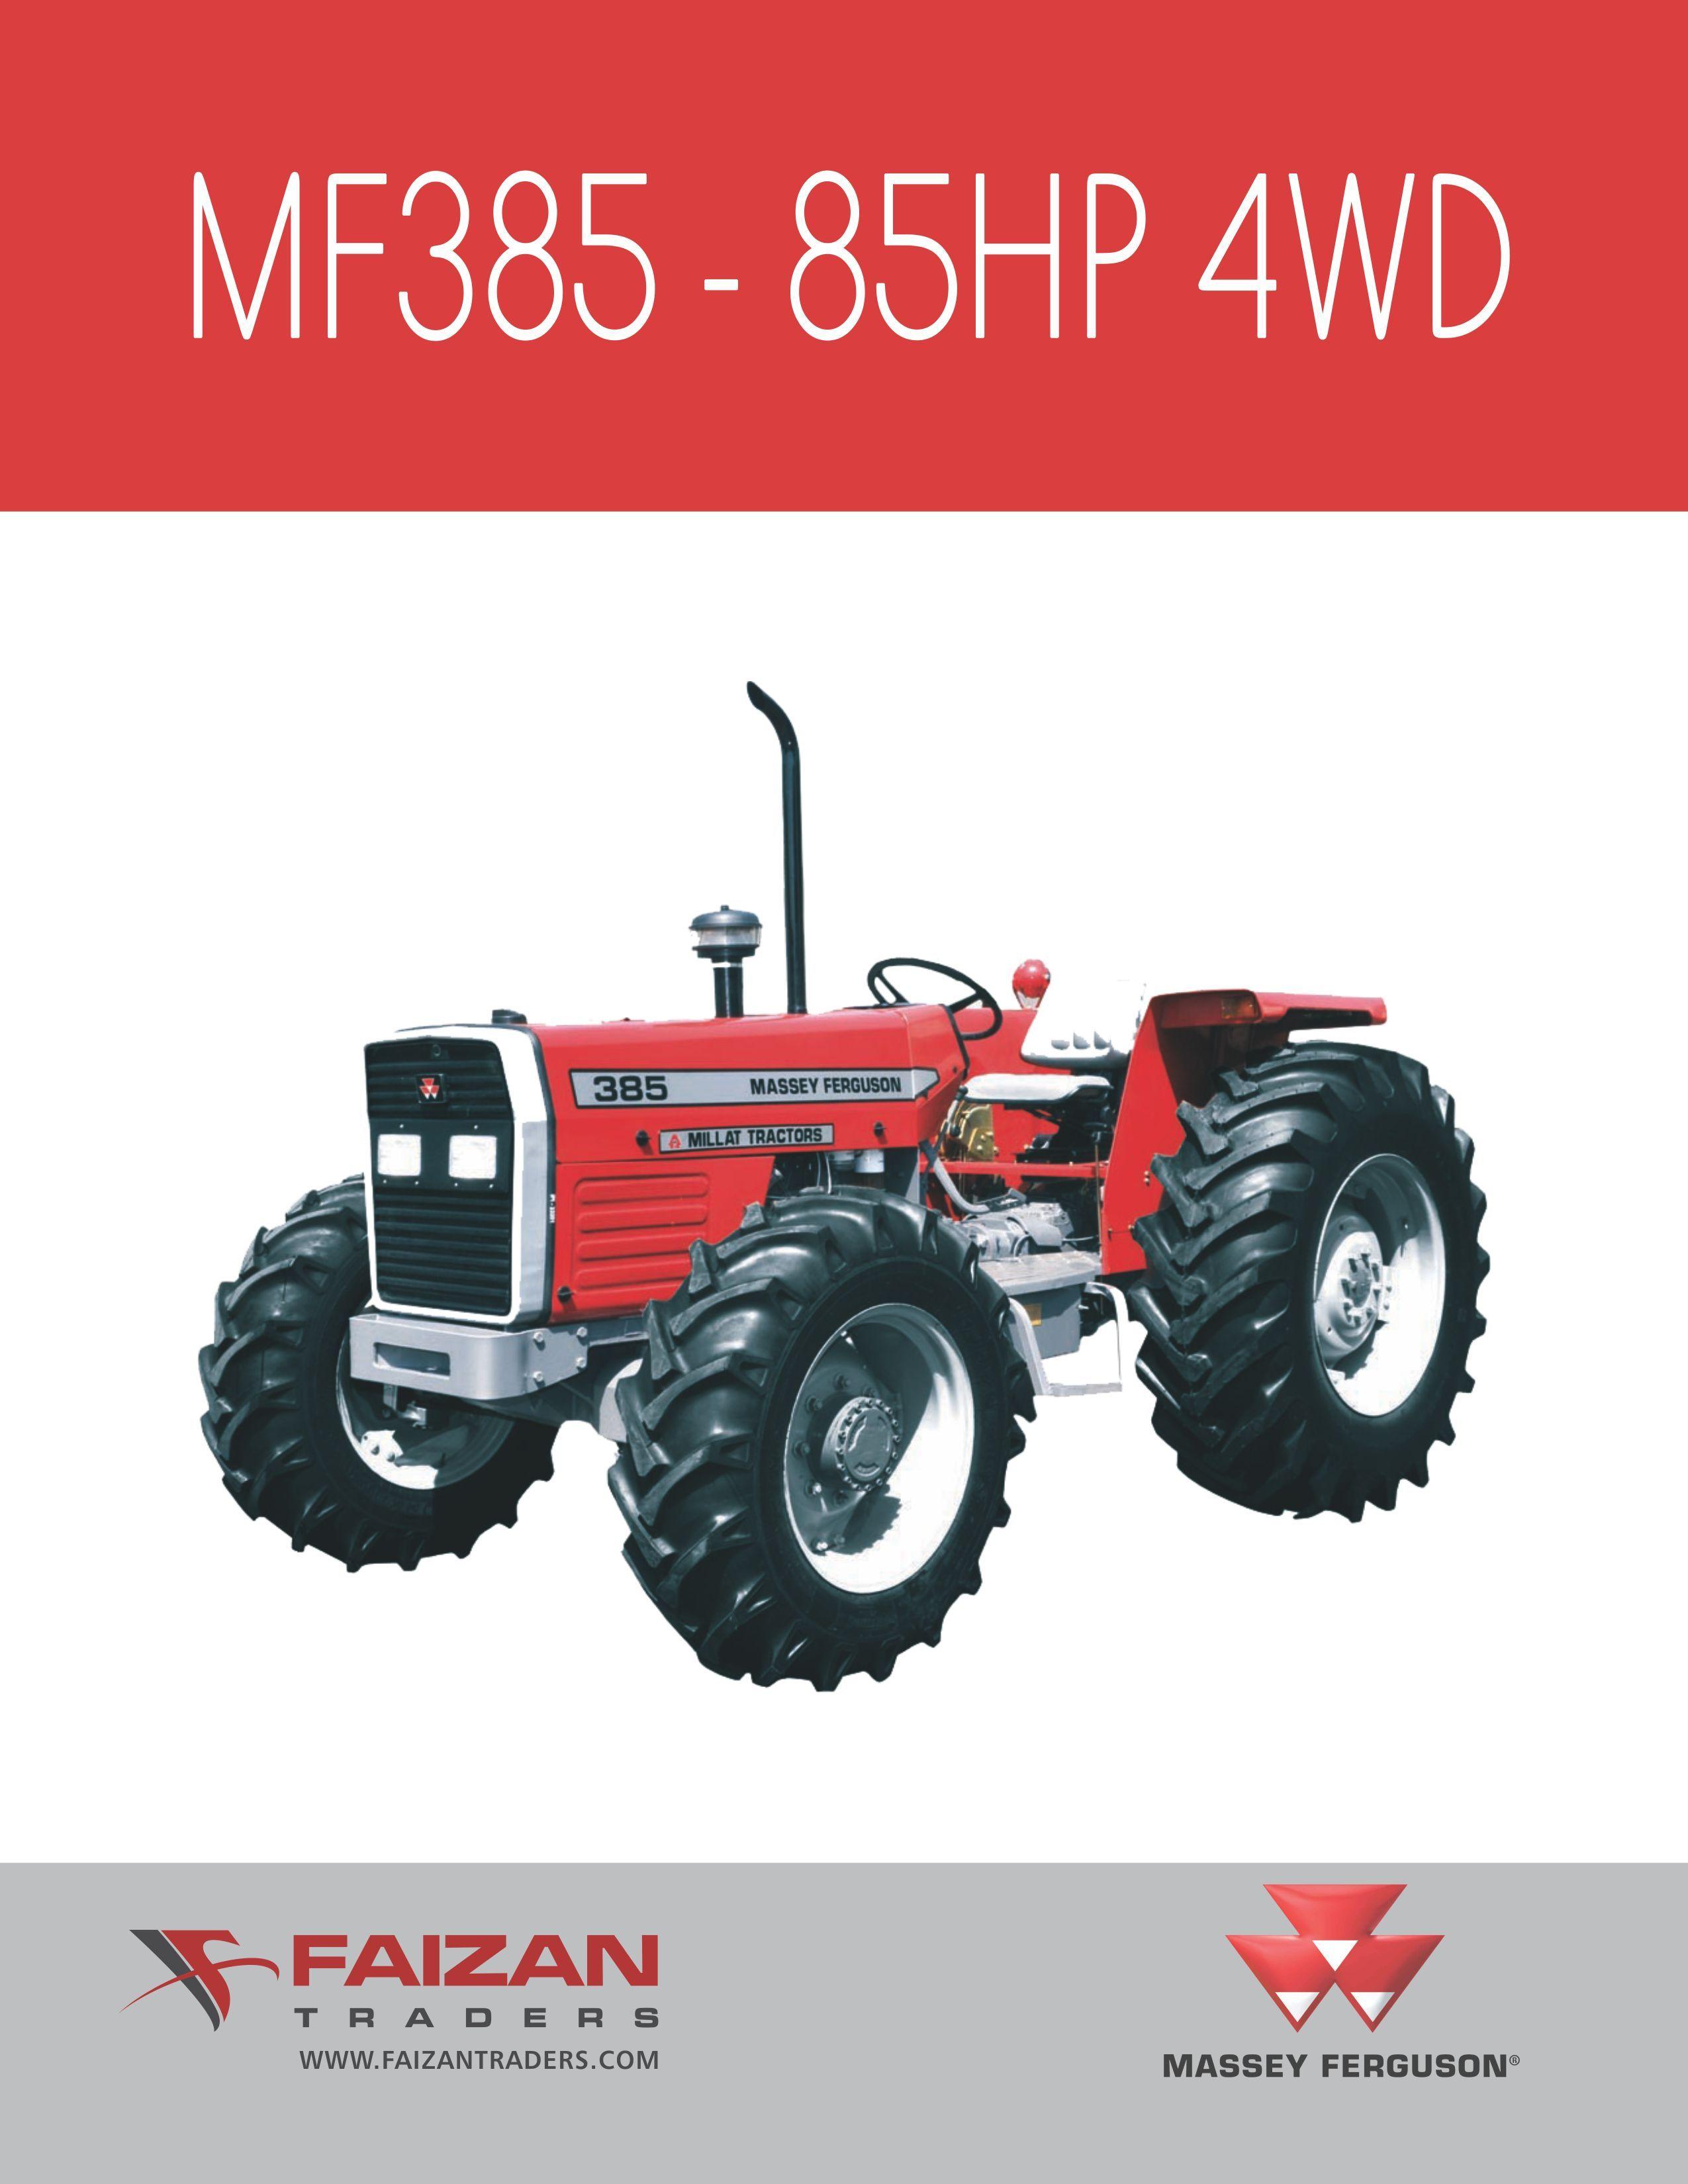 Farm tractors farm implements tractors accessories material handling import massey ferguson 385 4wd tractor from pakistan fandeluxe Gallery